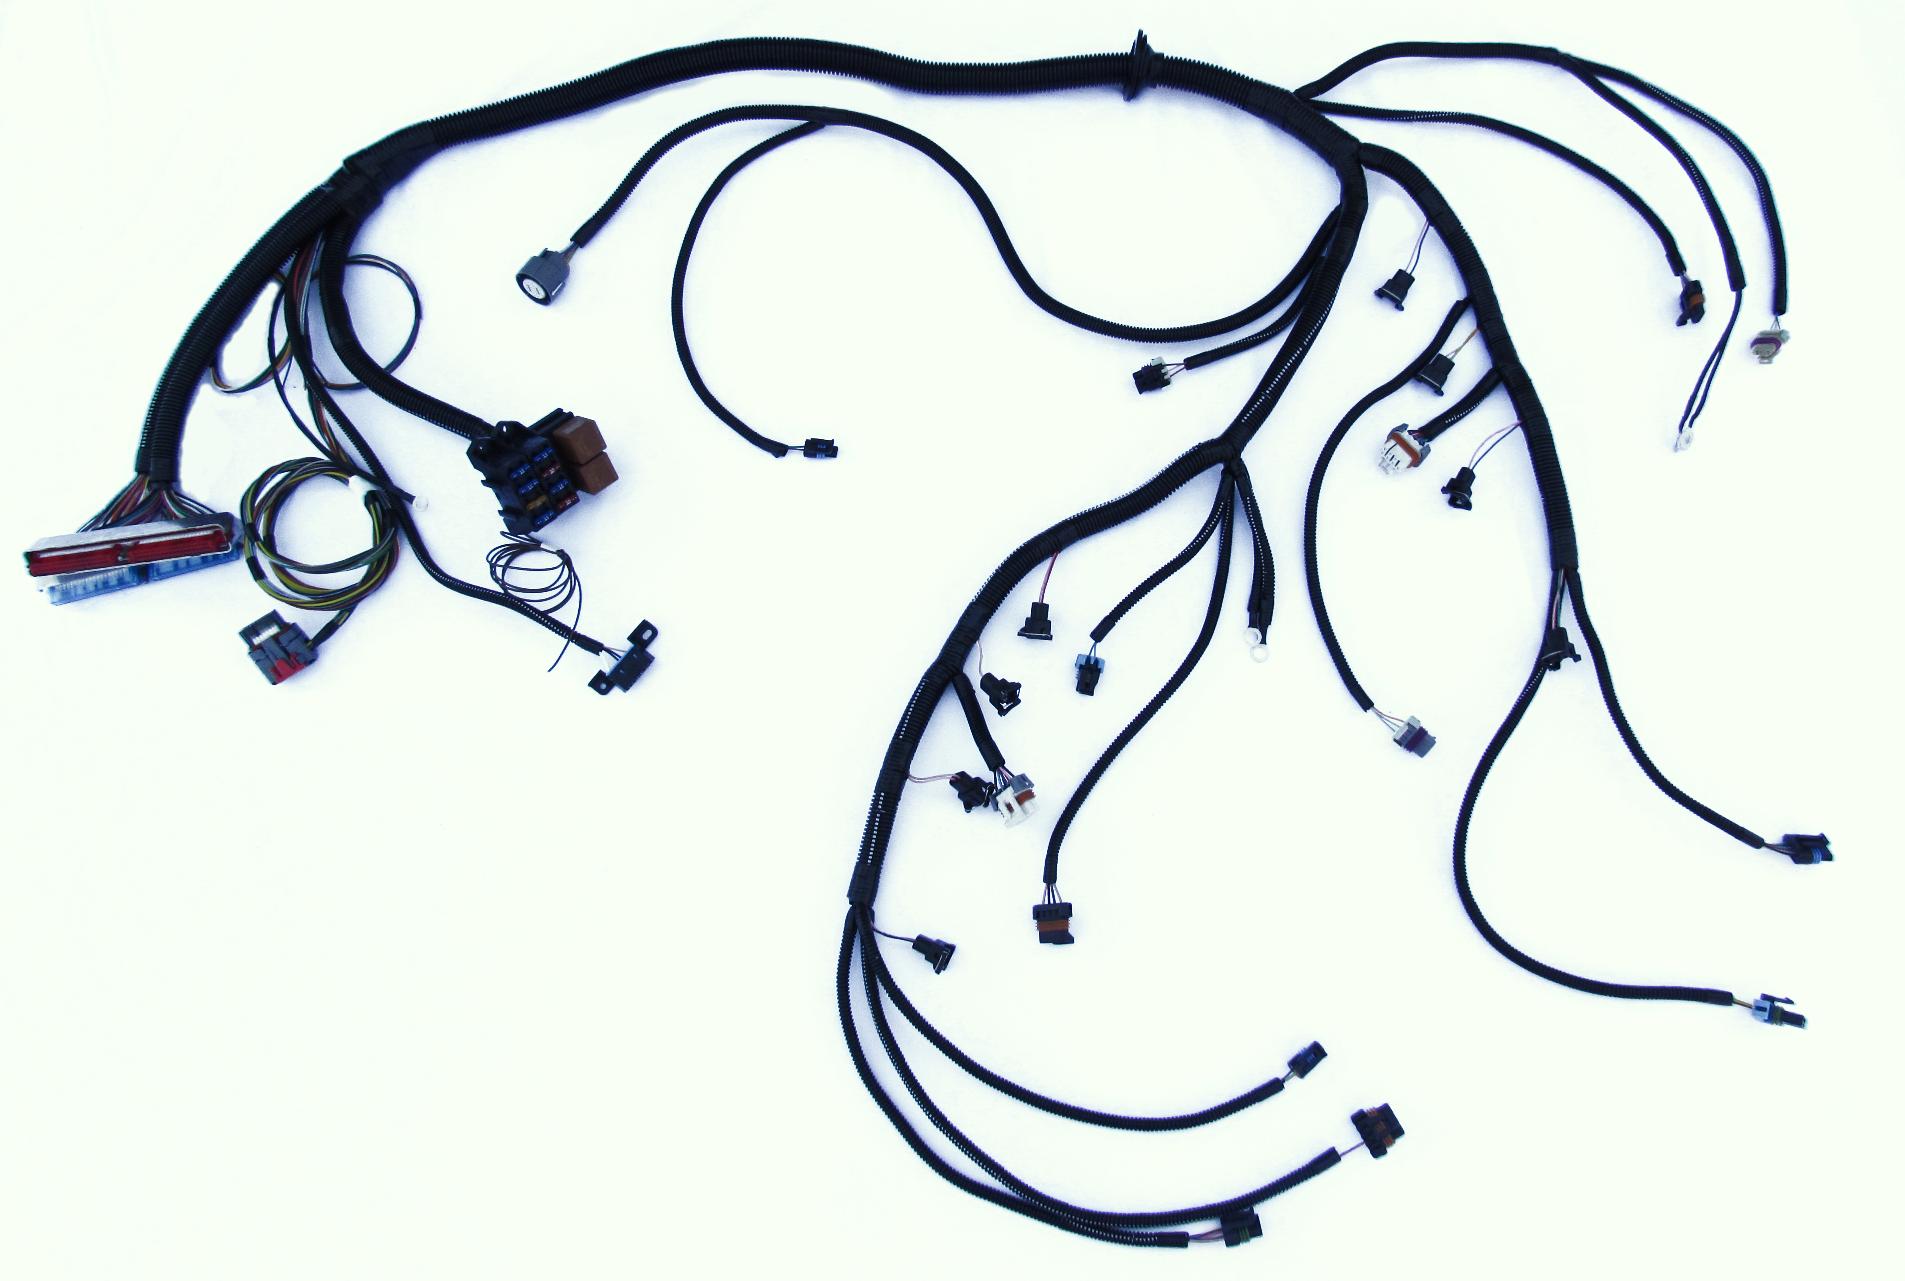 Photo Viewer 02 Vortec W 4l60e Standalone Wiring Harness Dbw Wire Harness Ls Swap